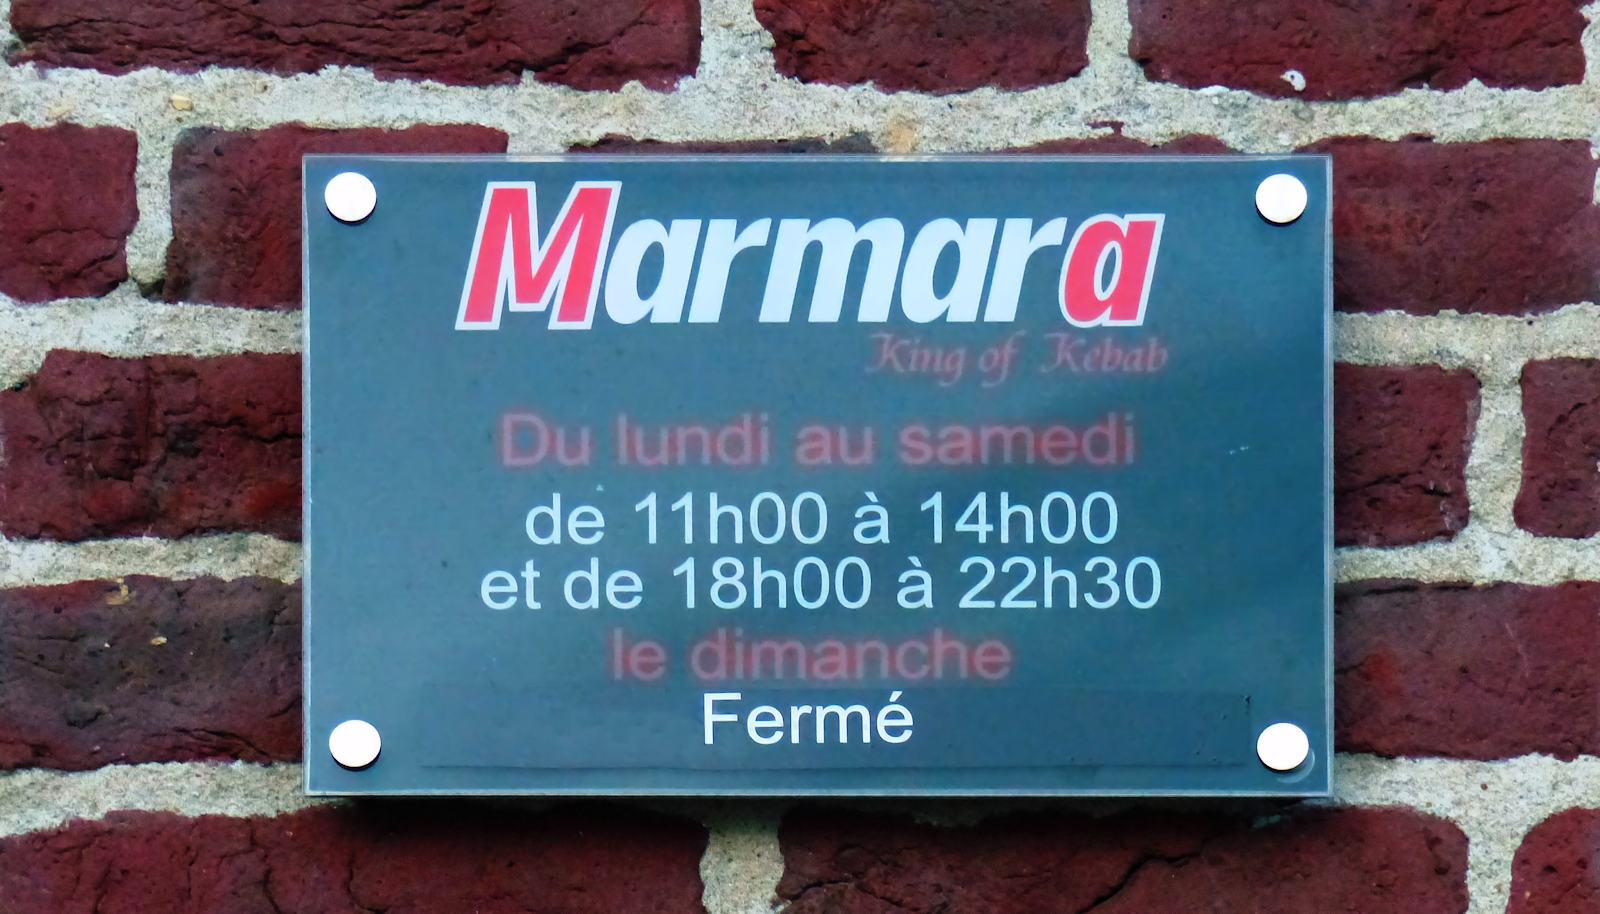 Marmara Kebab Tourcoing - Heures d'ouverture